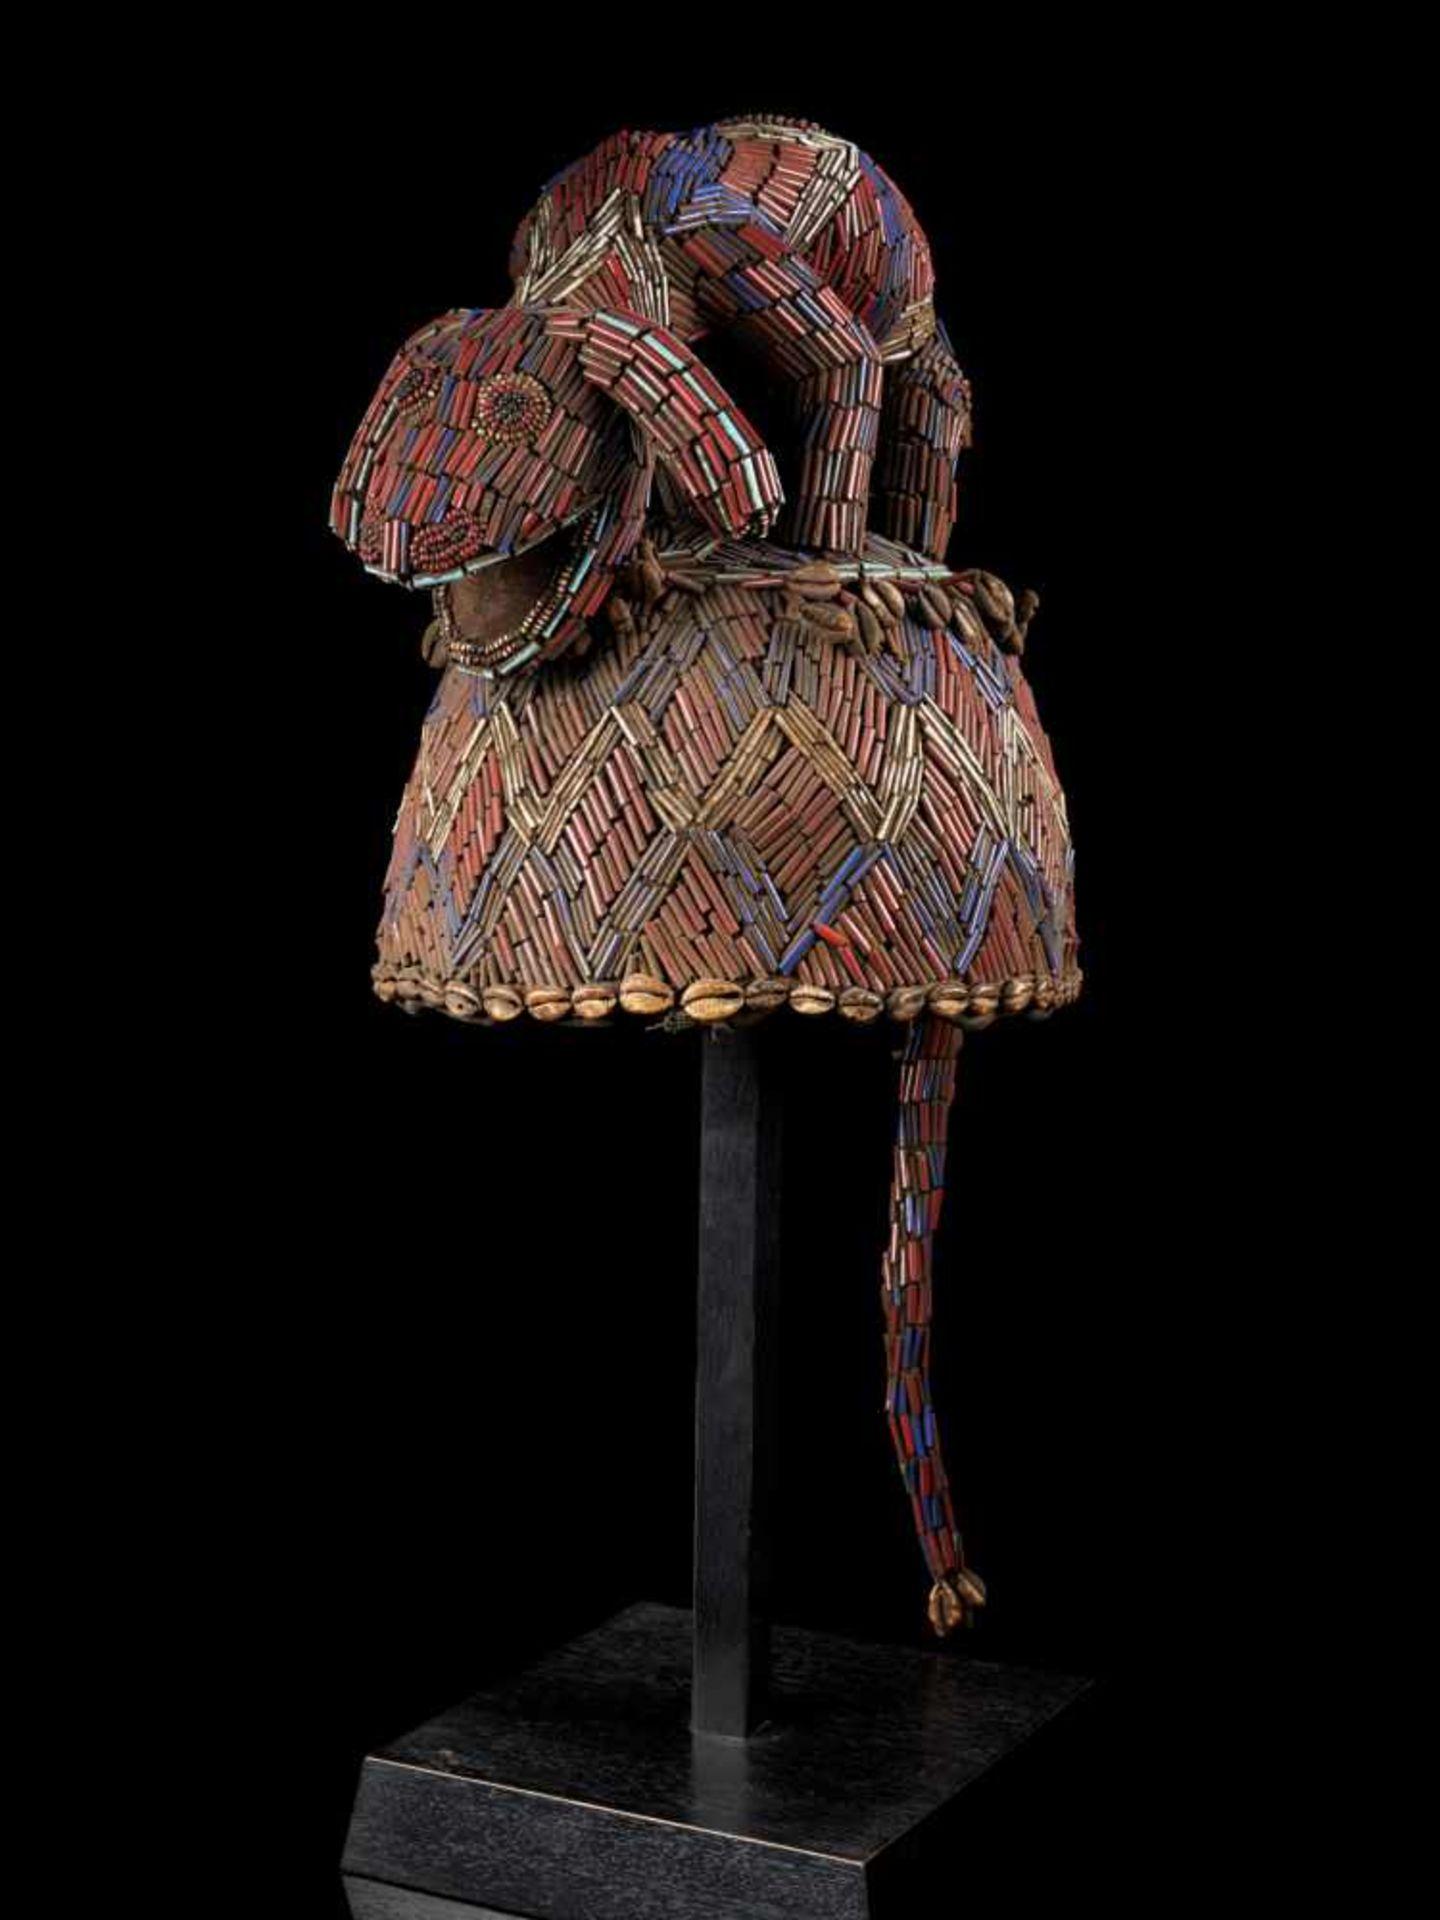 Beaded Blue Headdress With Kauris Finish - Tribal ArtThis impressive headdress is delightfully